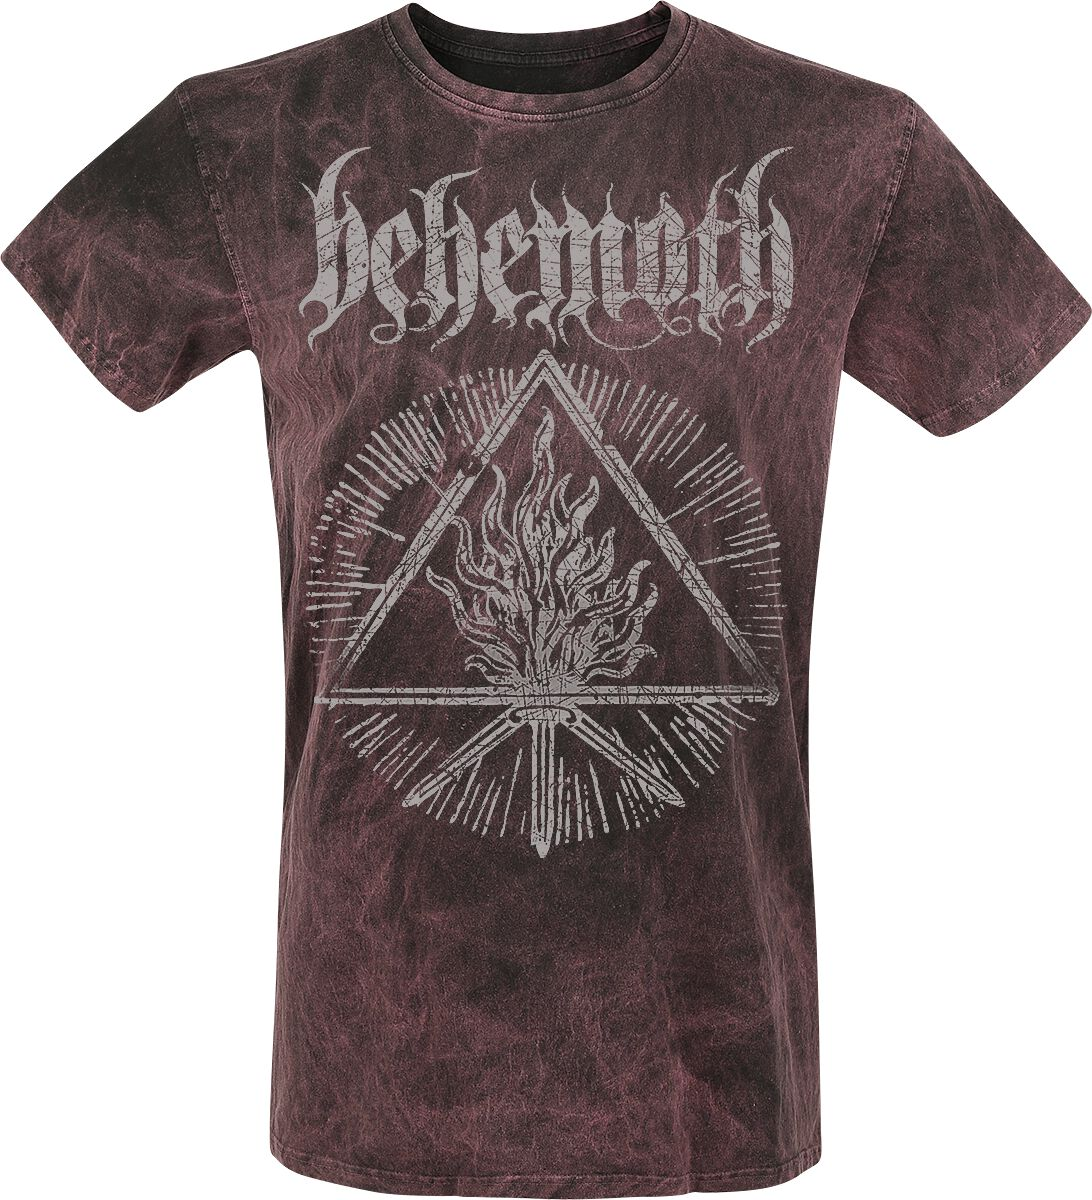 Image of Behemoth Furor Divinus T-Shirt dunkelrot/schwarz